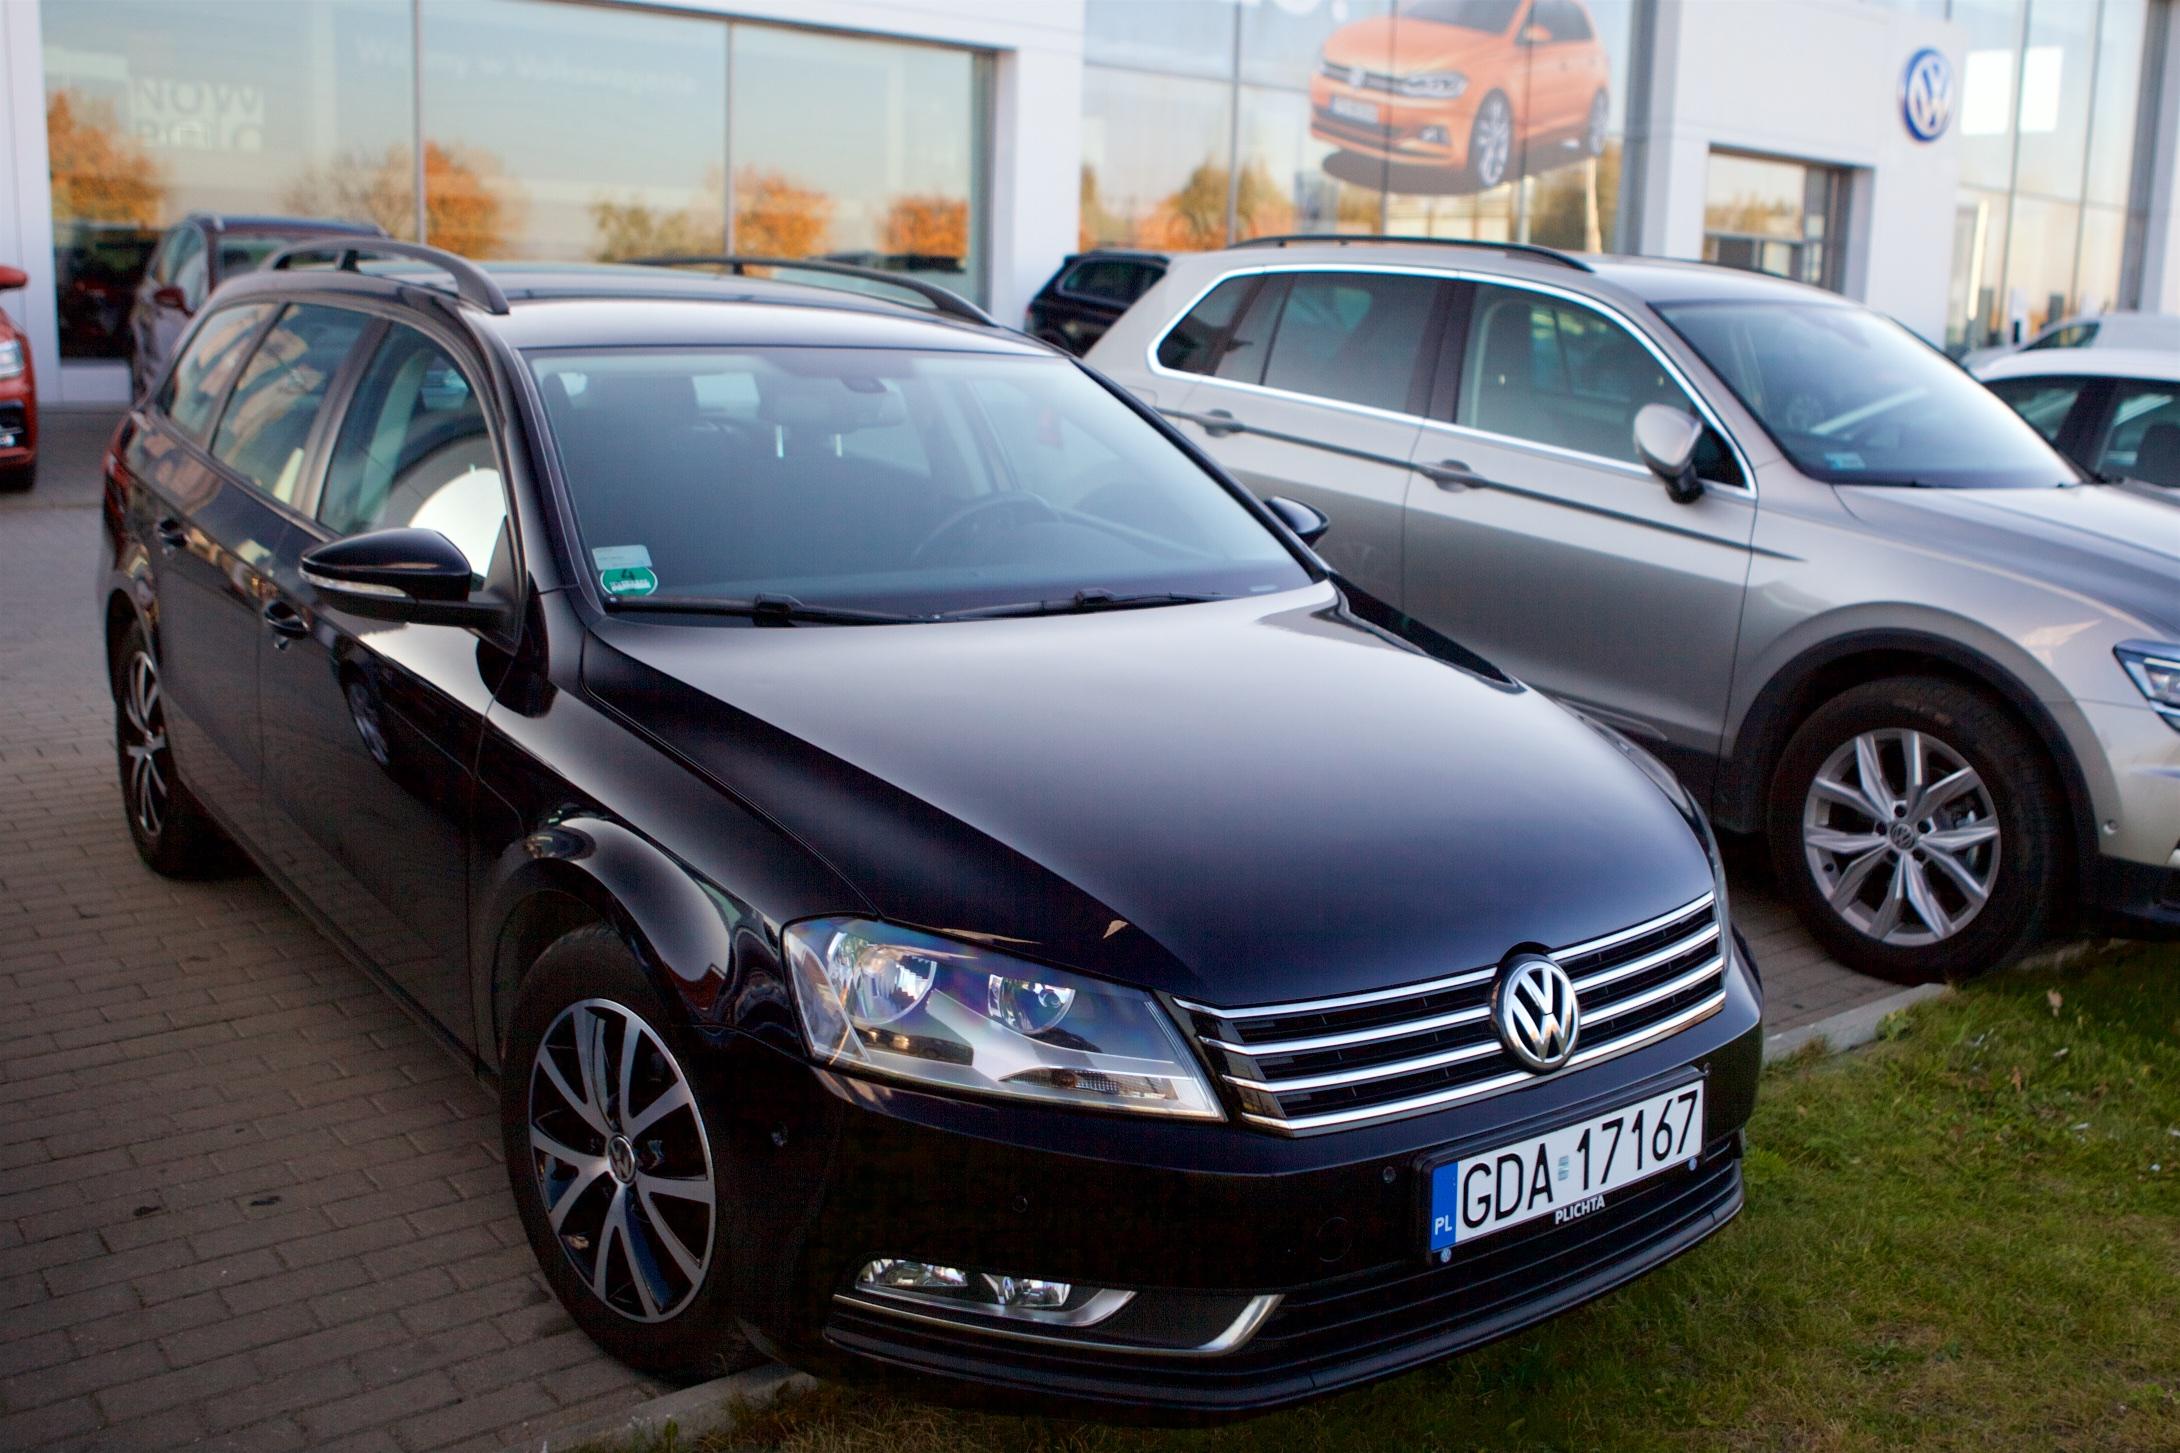 SPRZEDAM VW PASSAT B7 – 2011, 1,6 CR